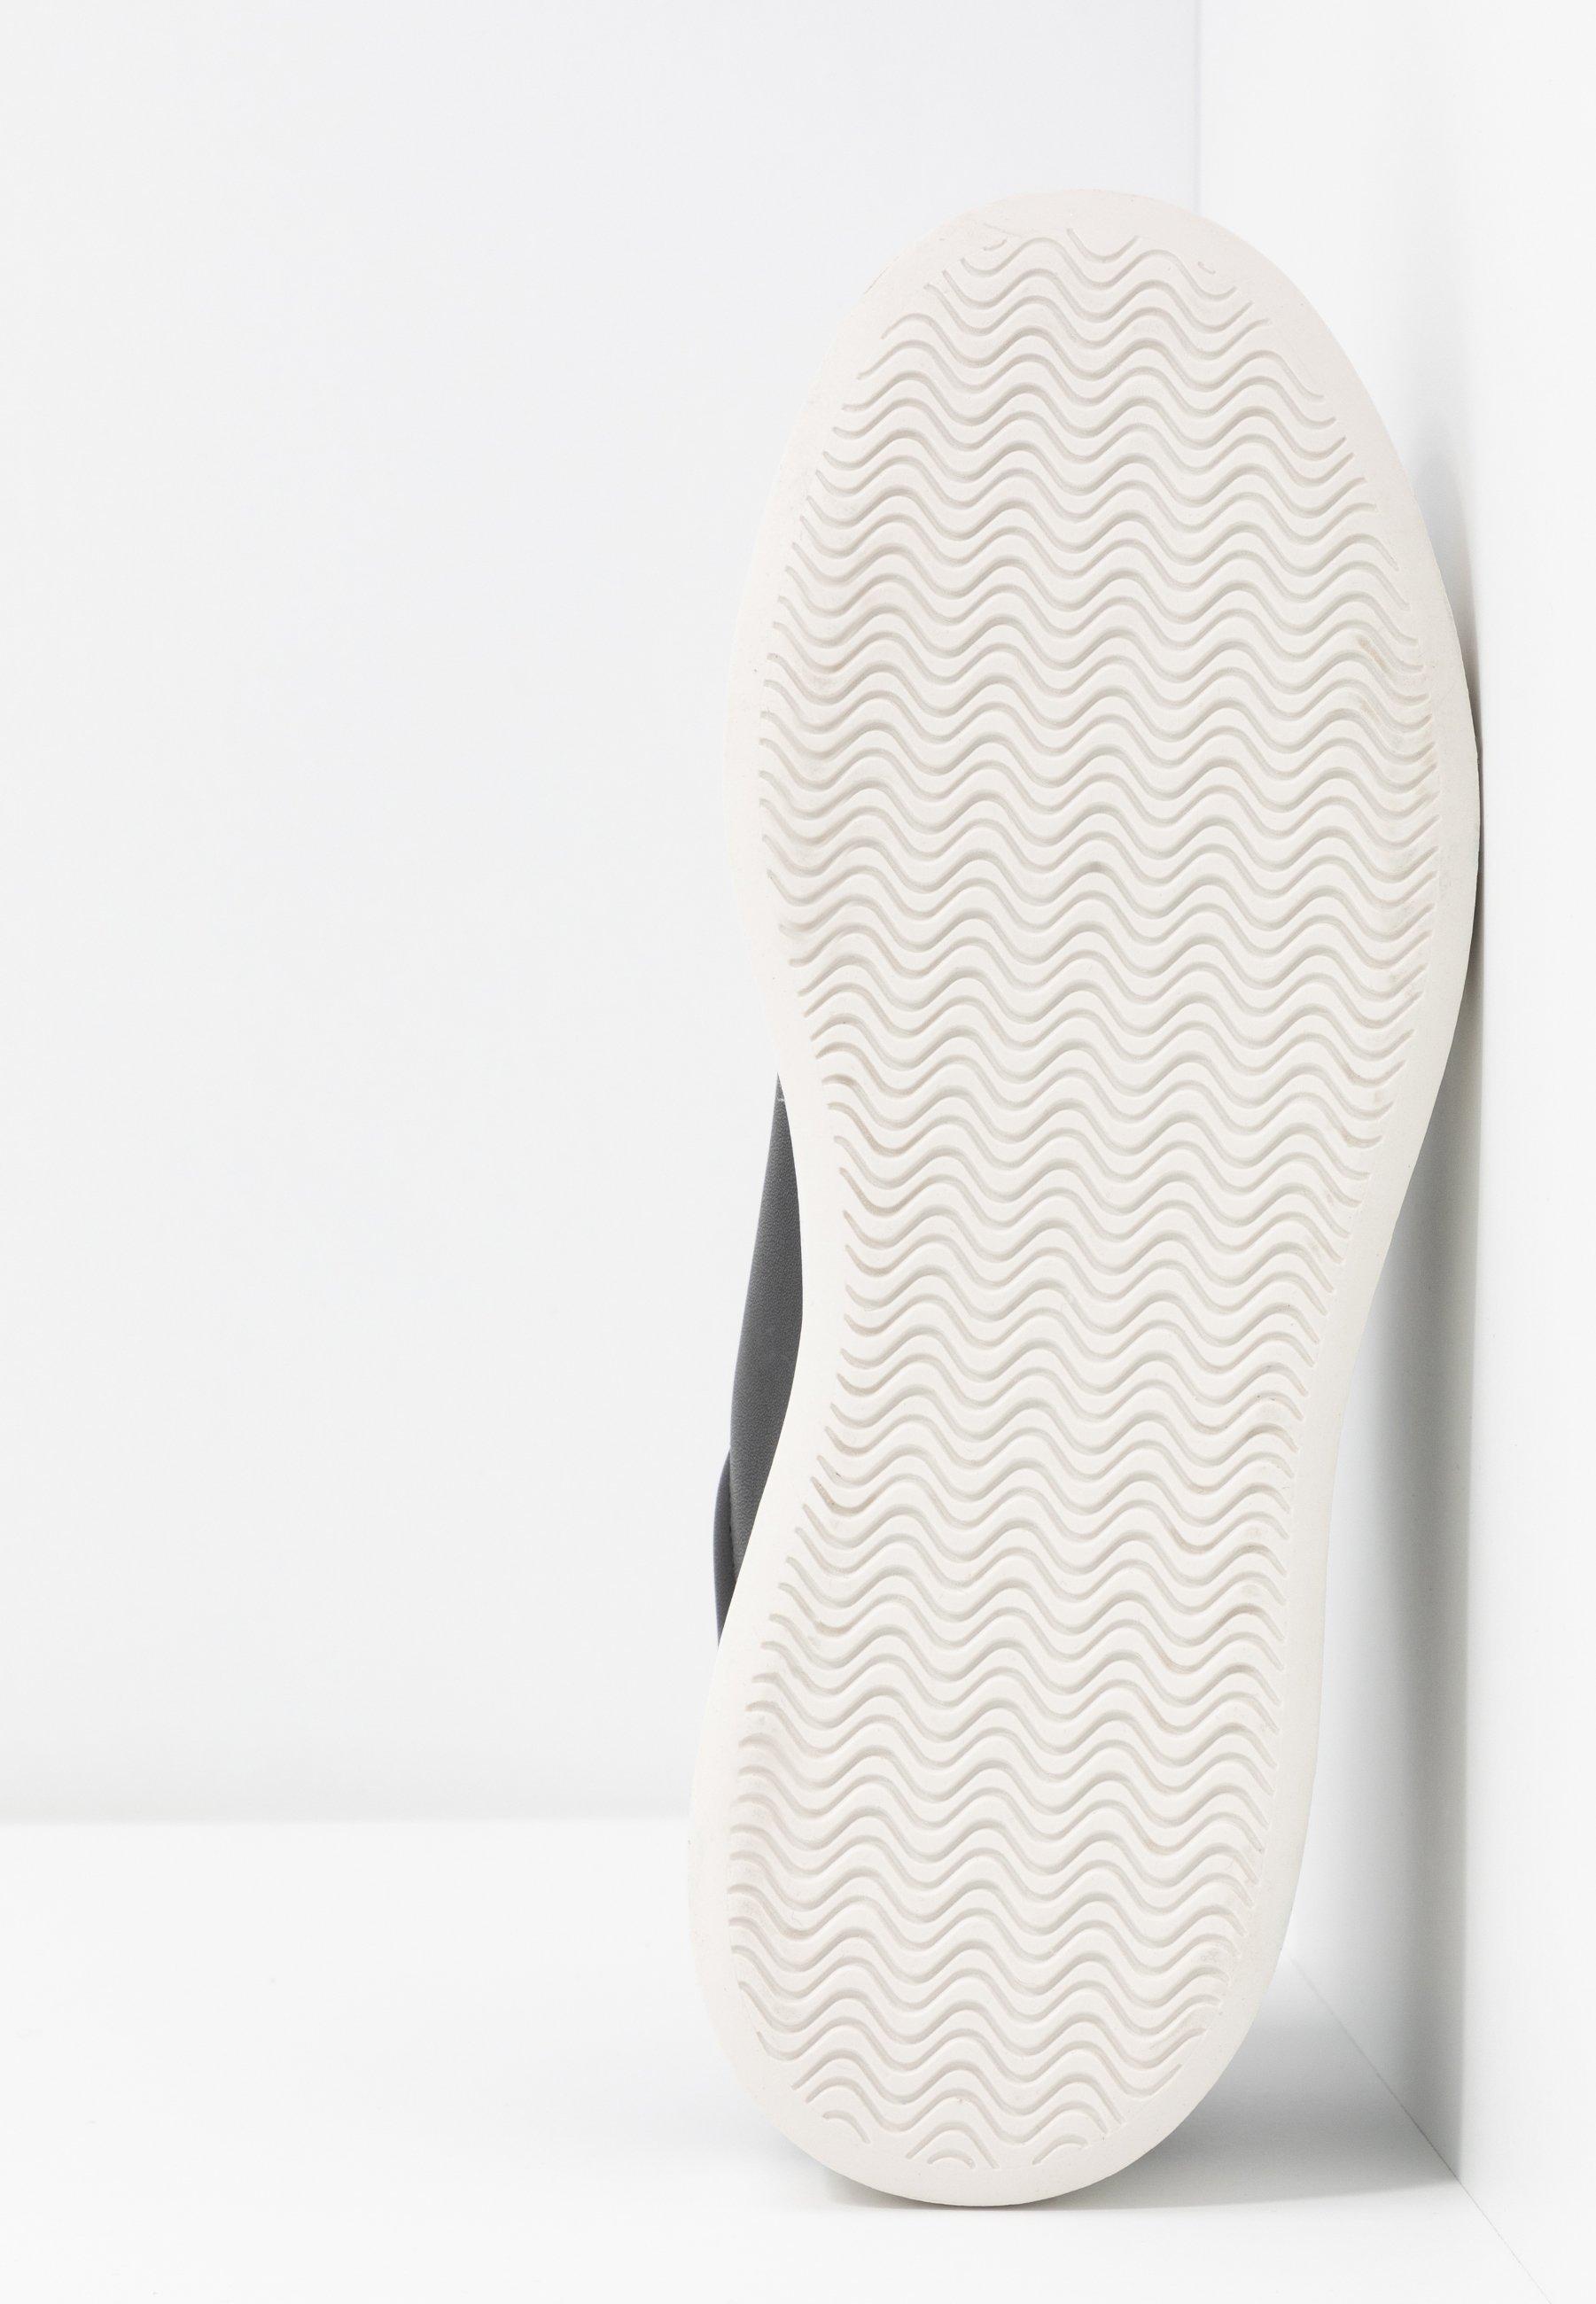 U.S. Polo Assn. BLANCH - Baskets basses - black - Sneakers femme Excellent